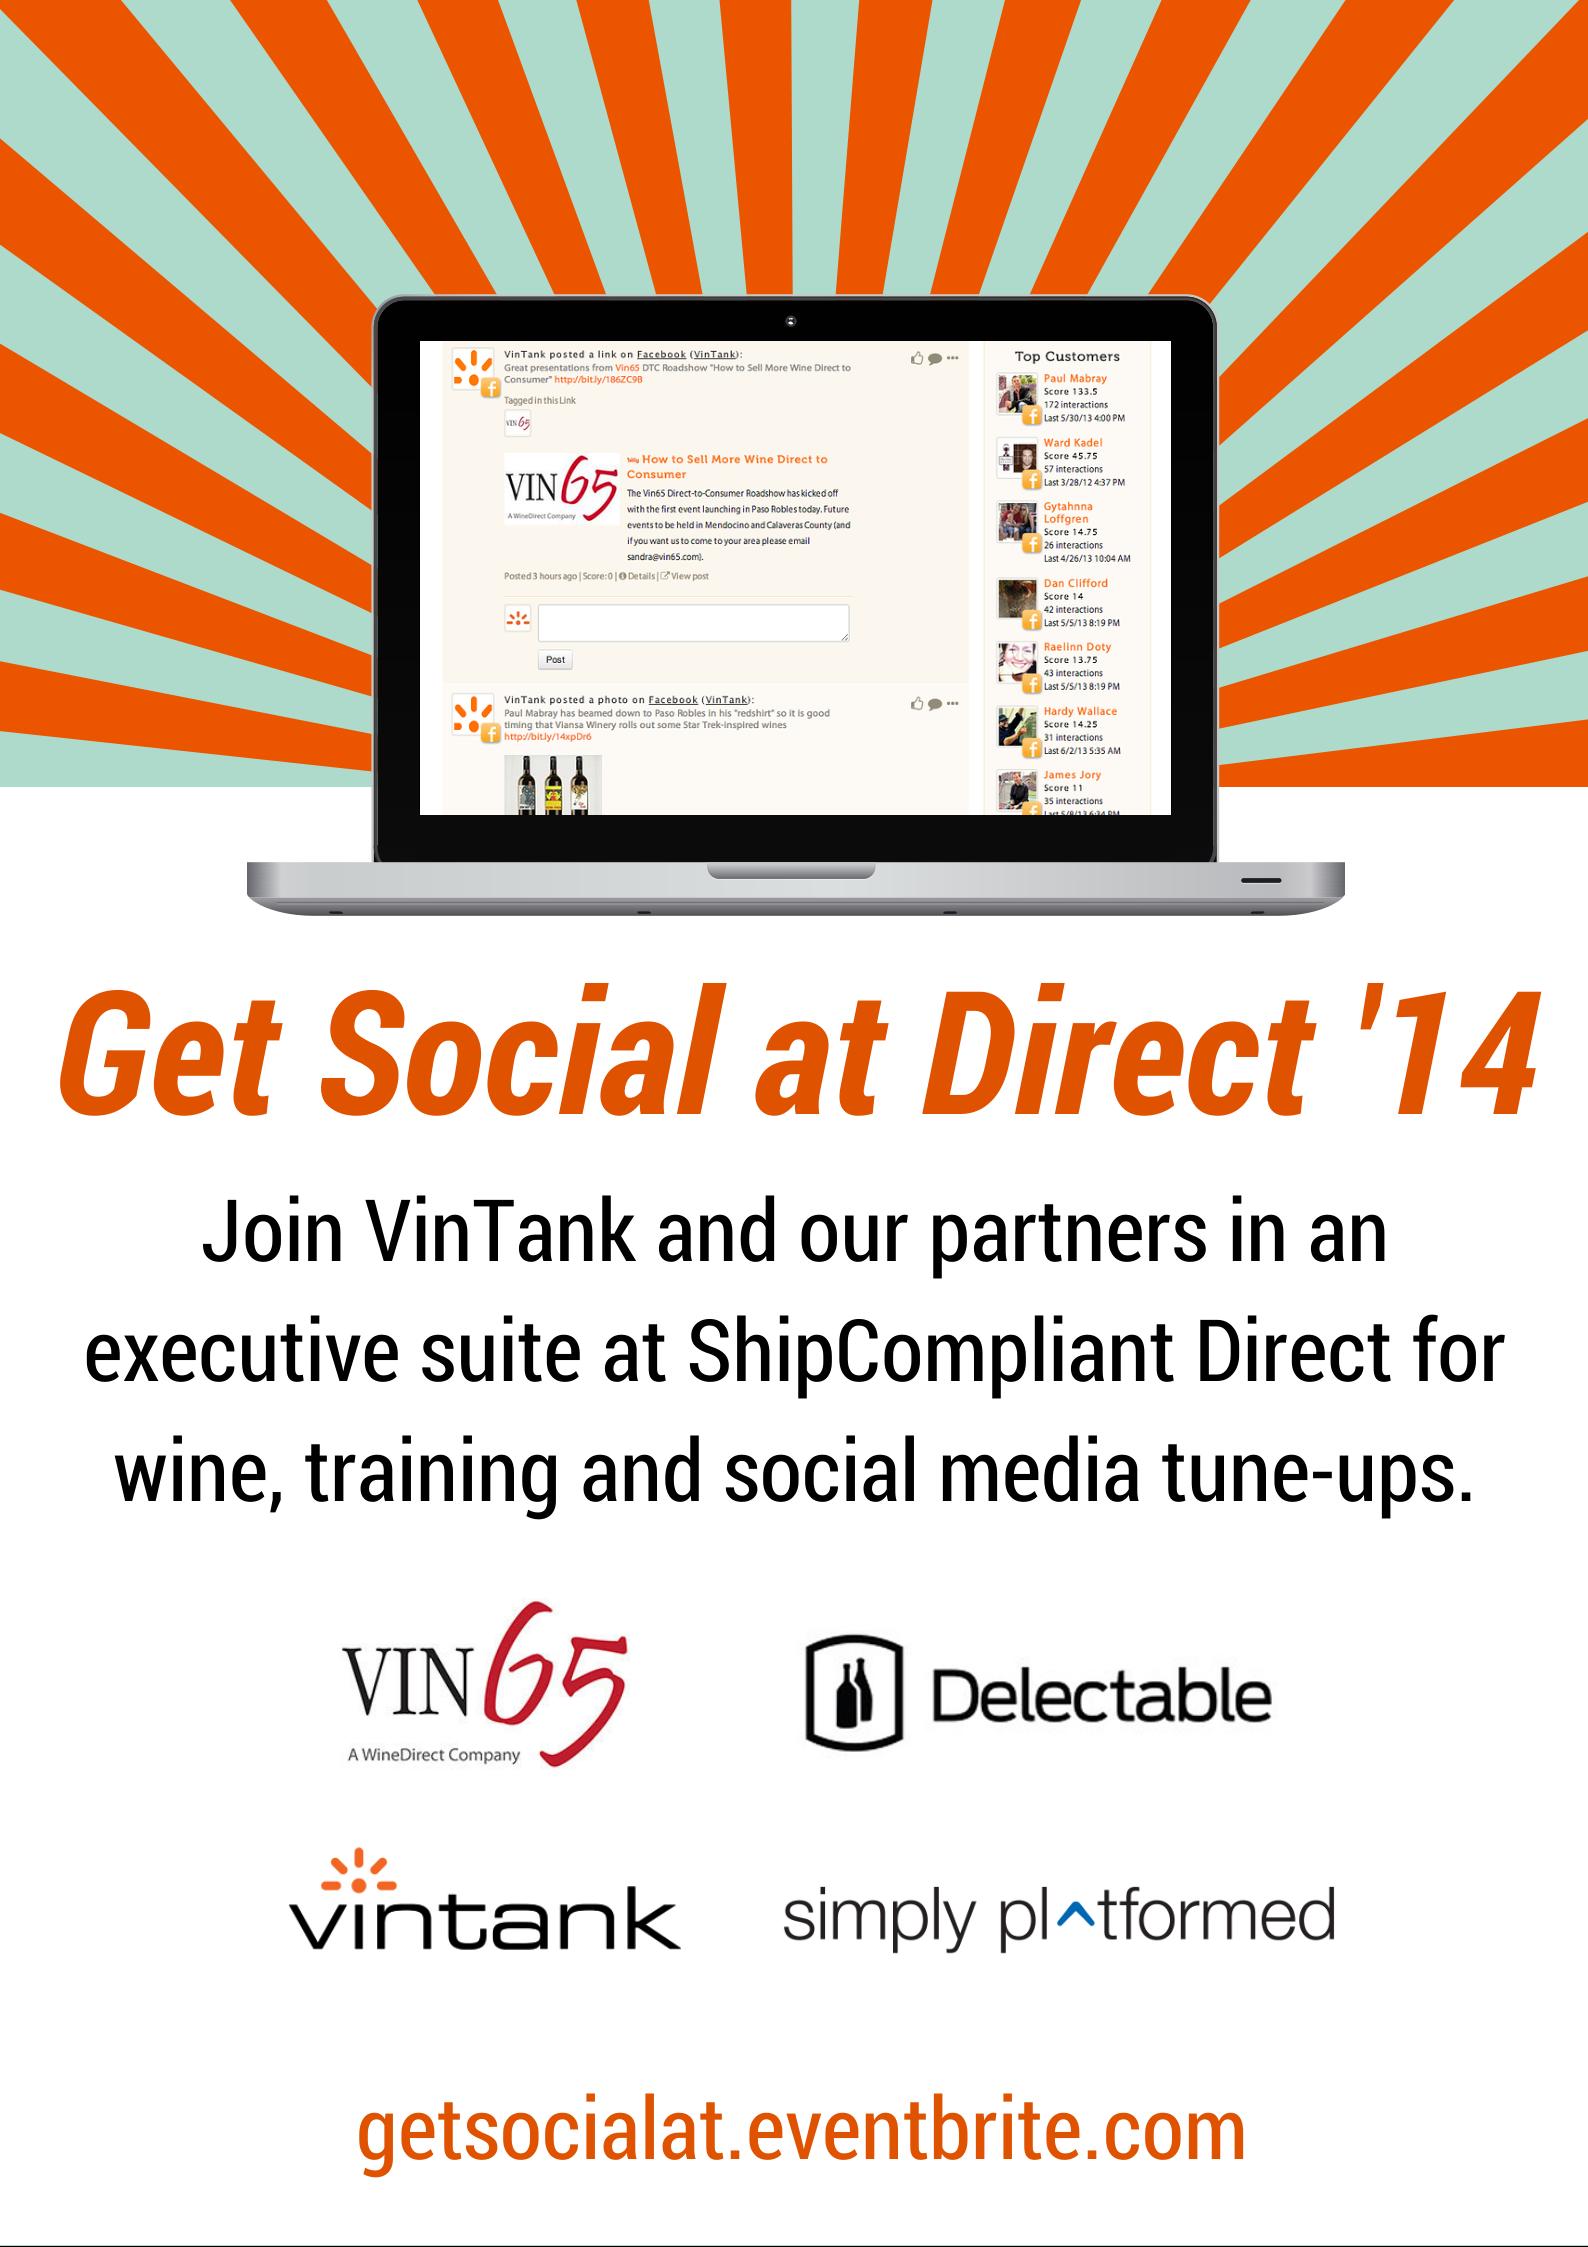 Get Social at Direct 2014